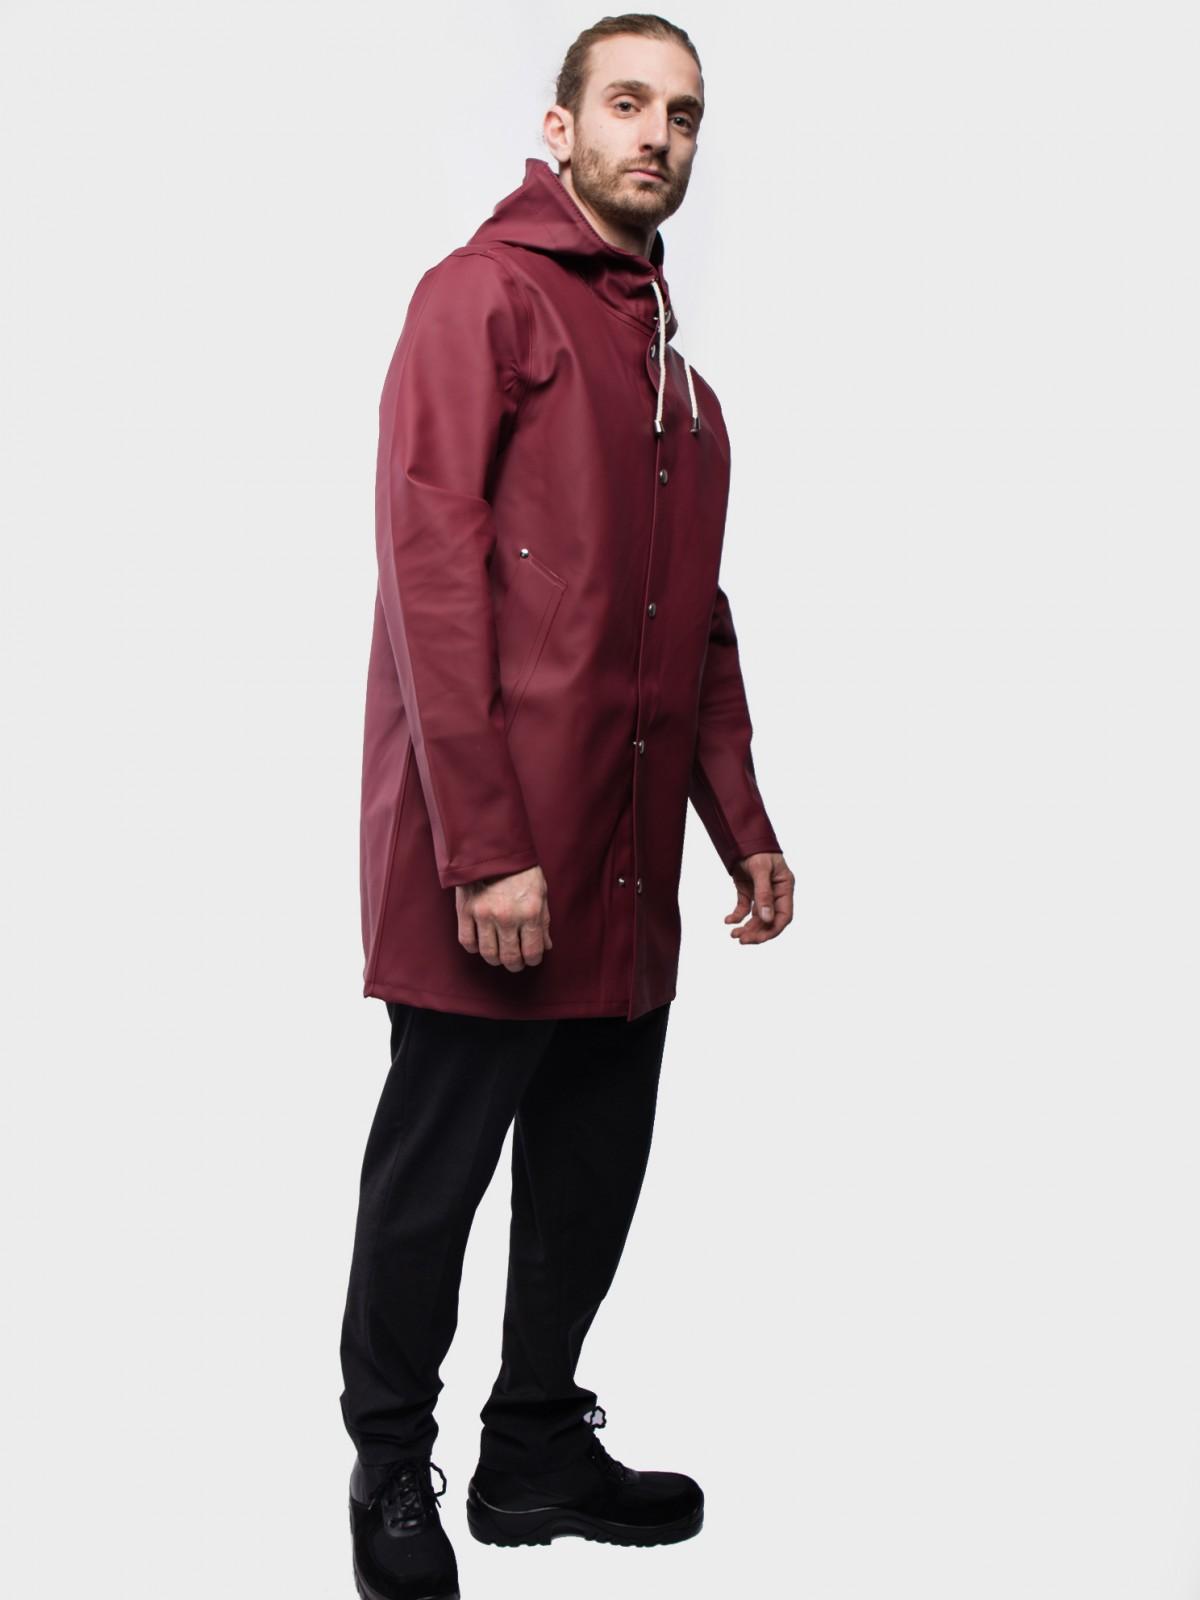 Stutterheim Stockholm Raincoat in Burgundy